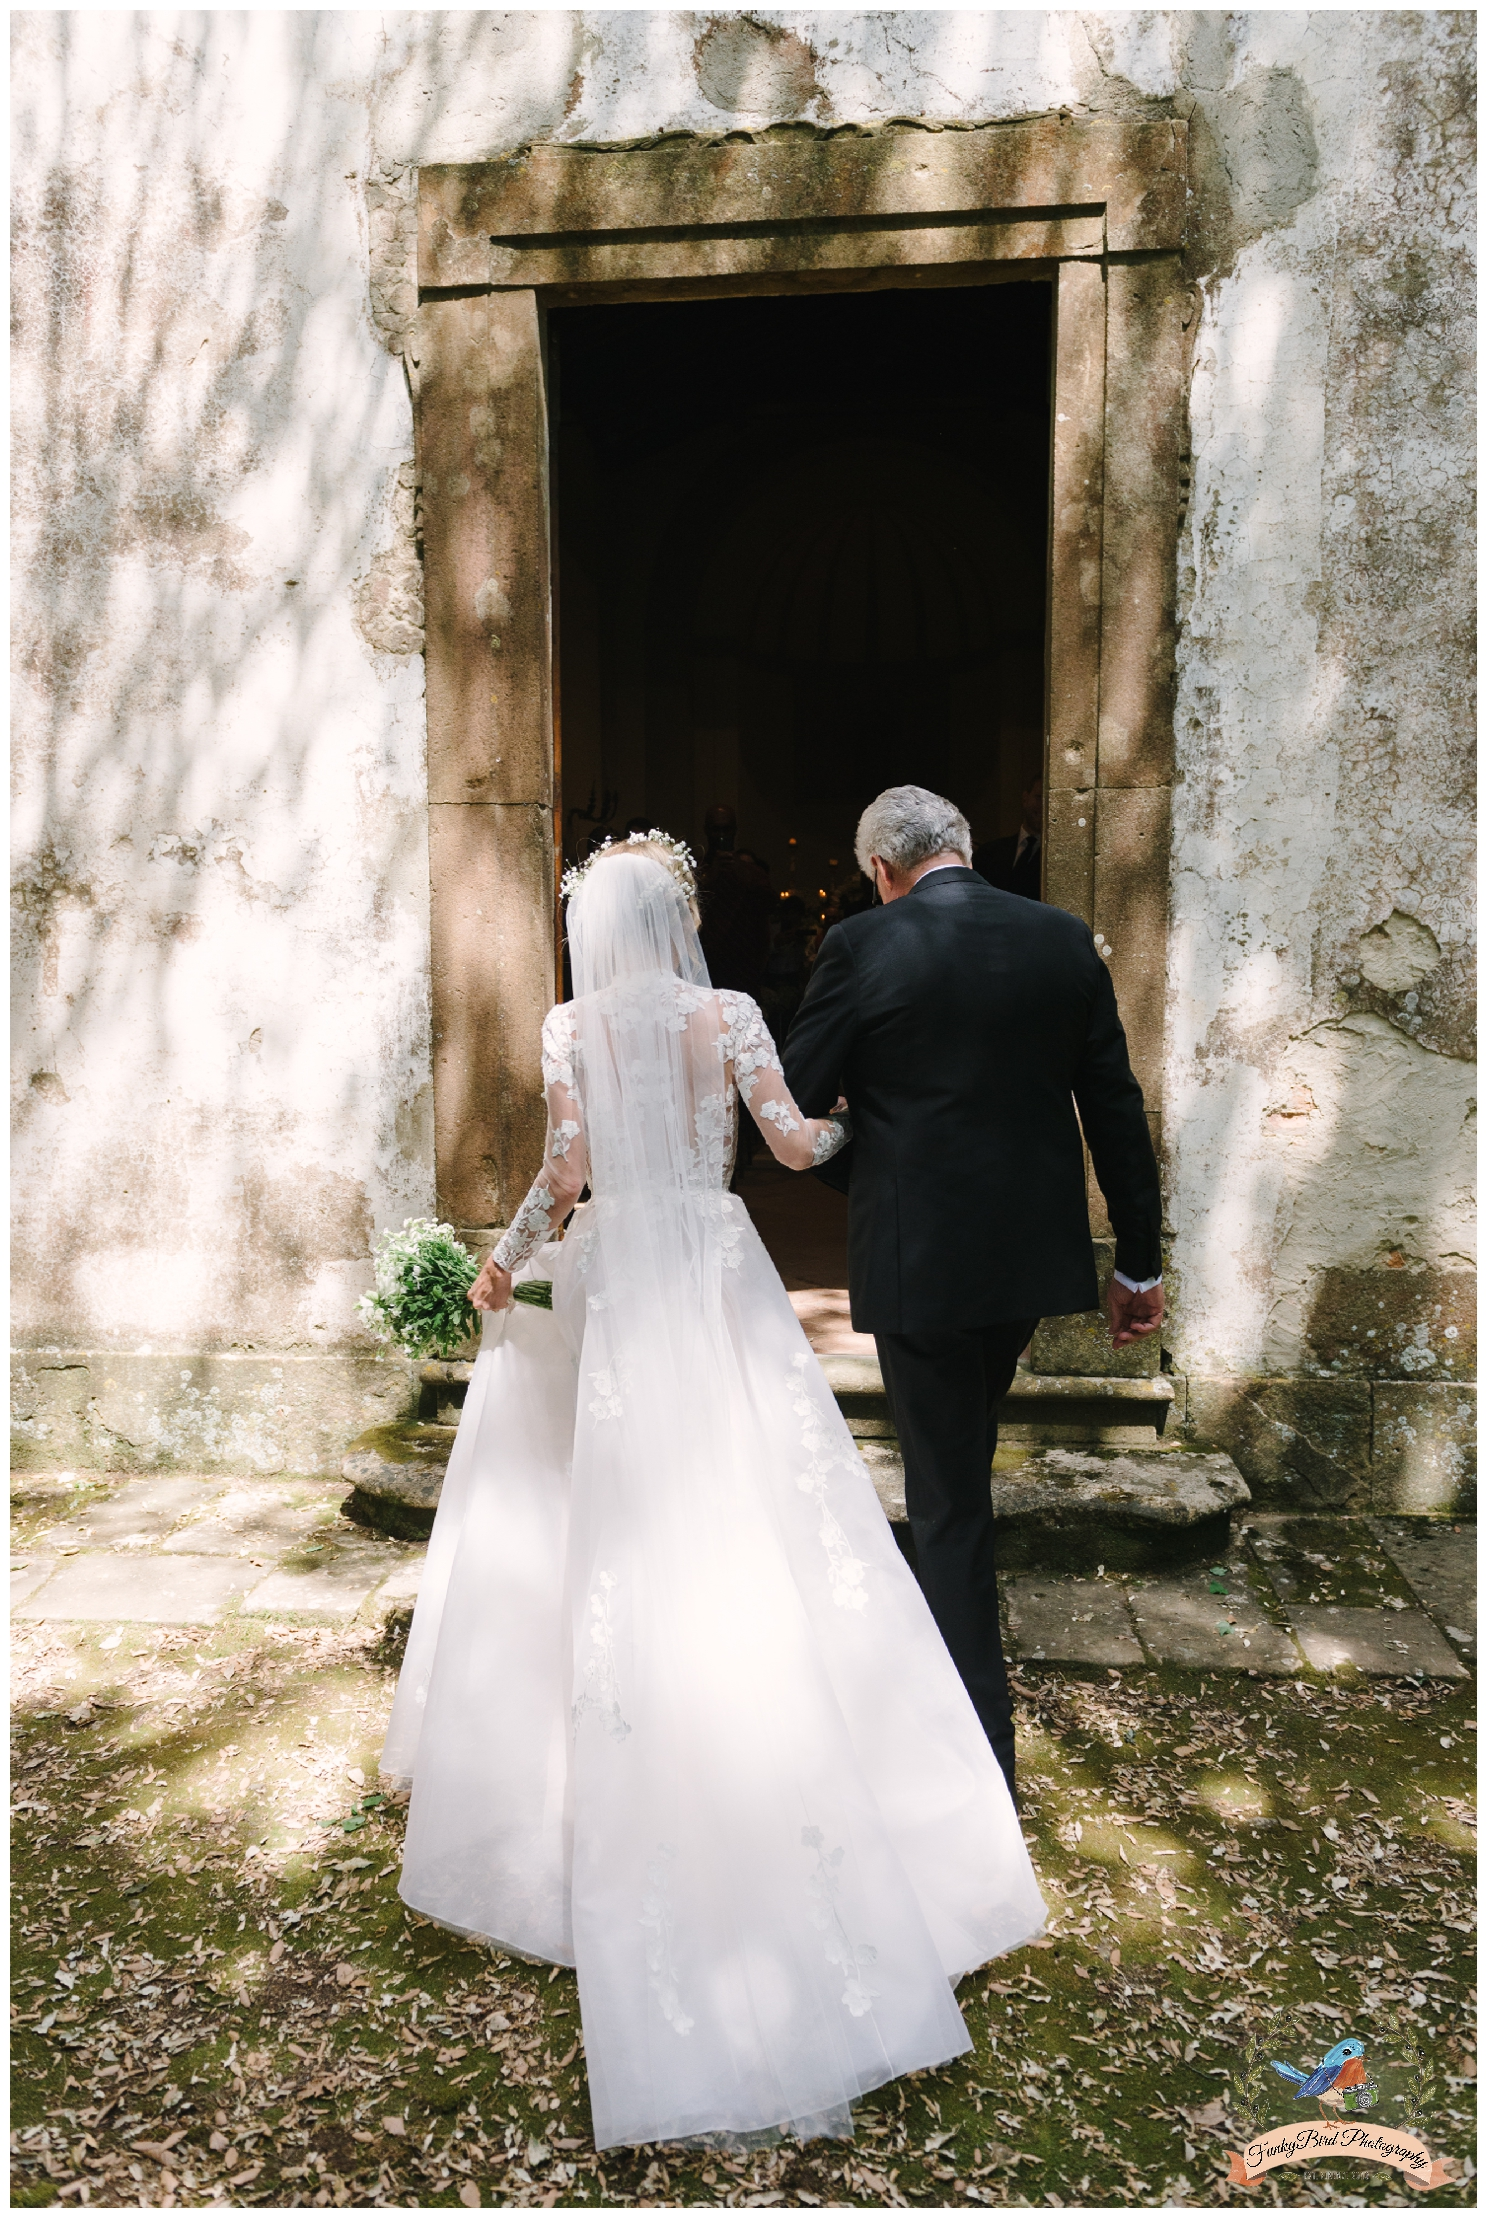 Wedding_Photographer_Tuscany_Bryllupsfotograf_0027.jpg